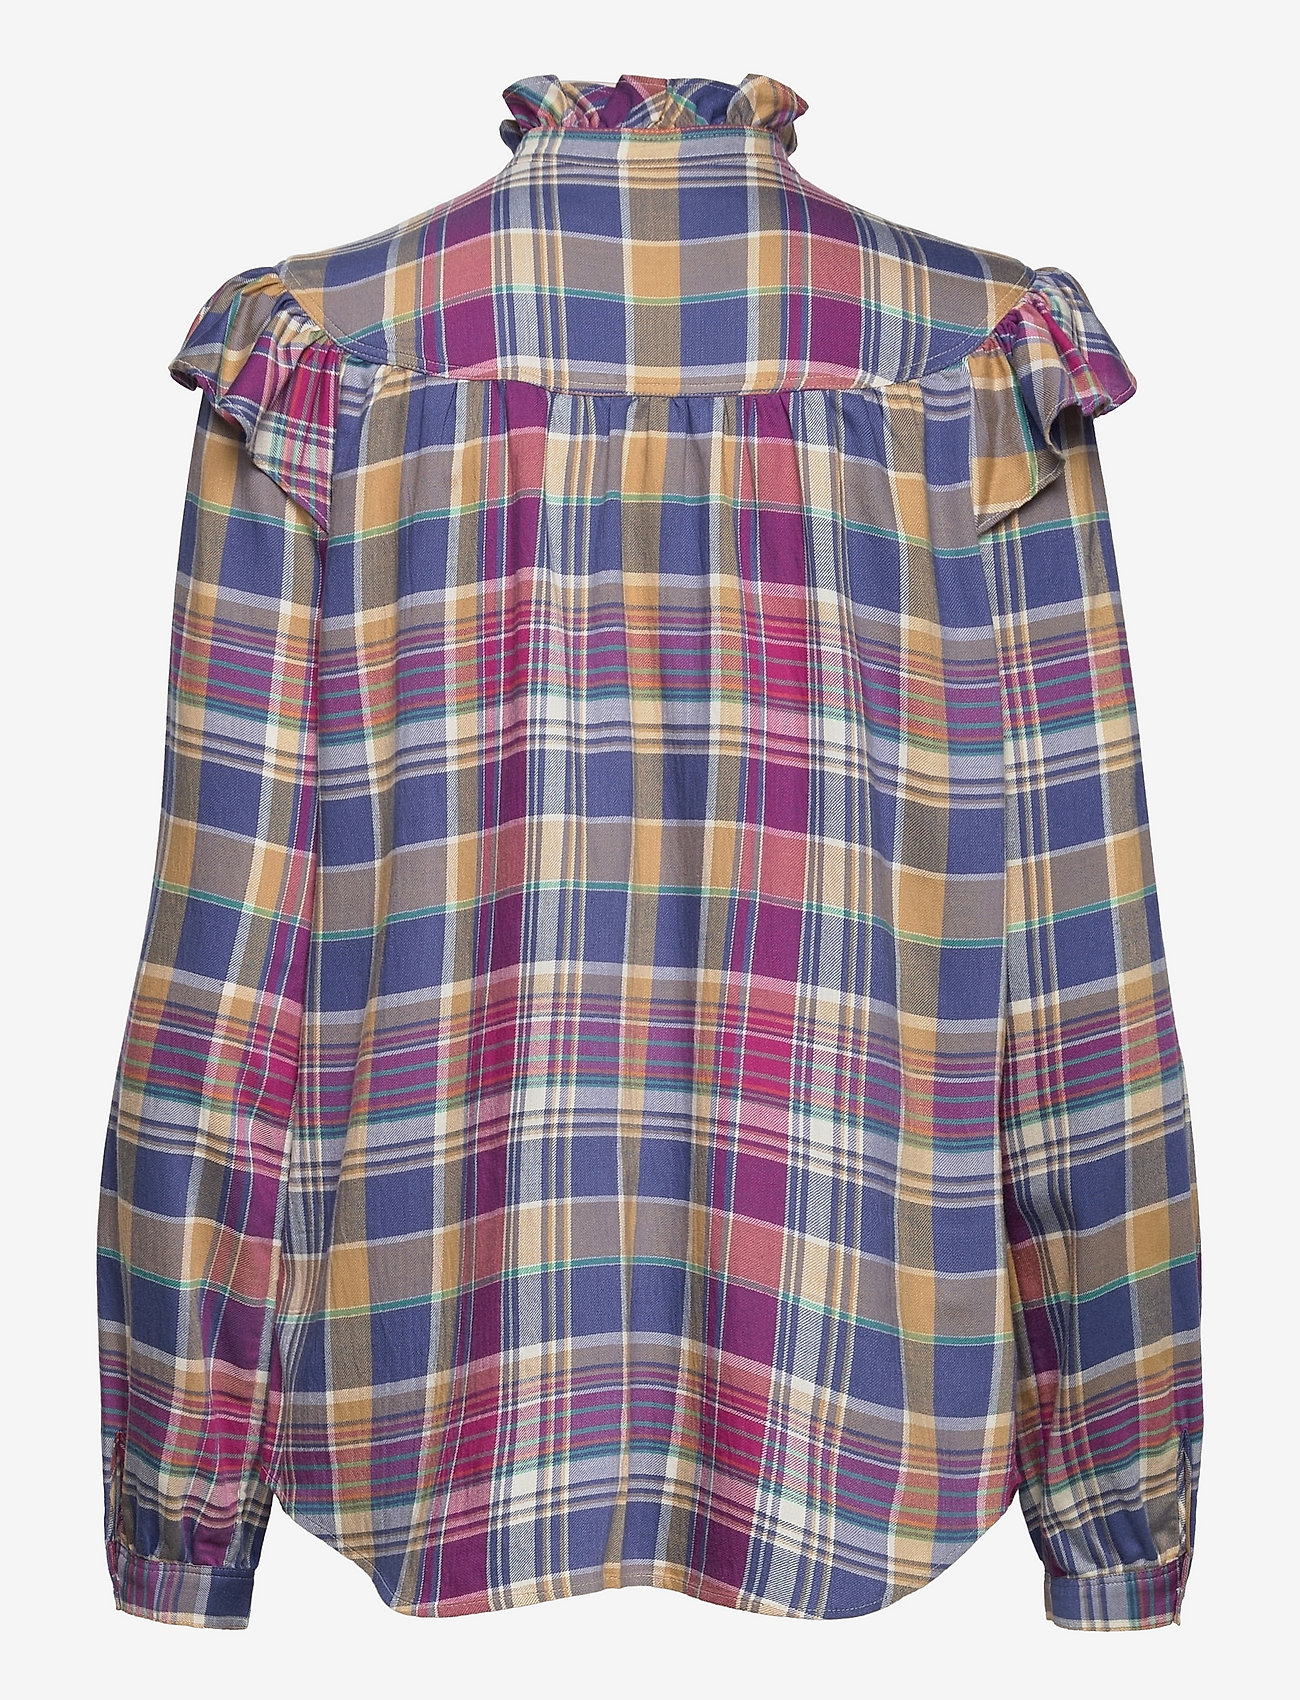 Polo Ralph Lauren - Ruffle-Trim Plaid Shirt - long-sleeved shirts - 825 blue/magenta - 1